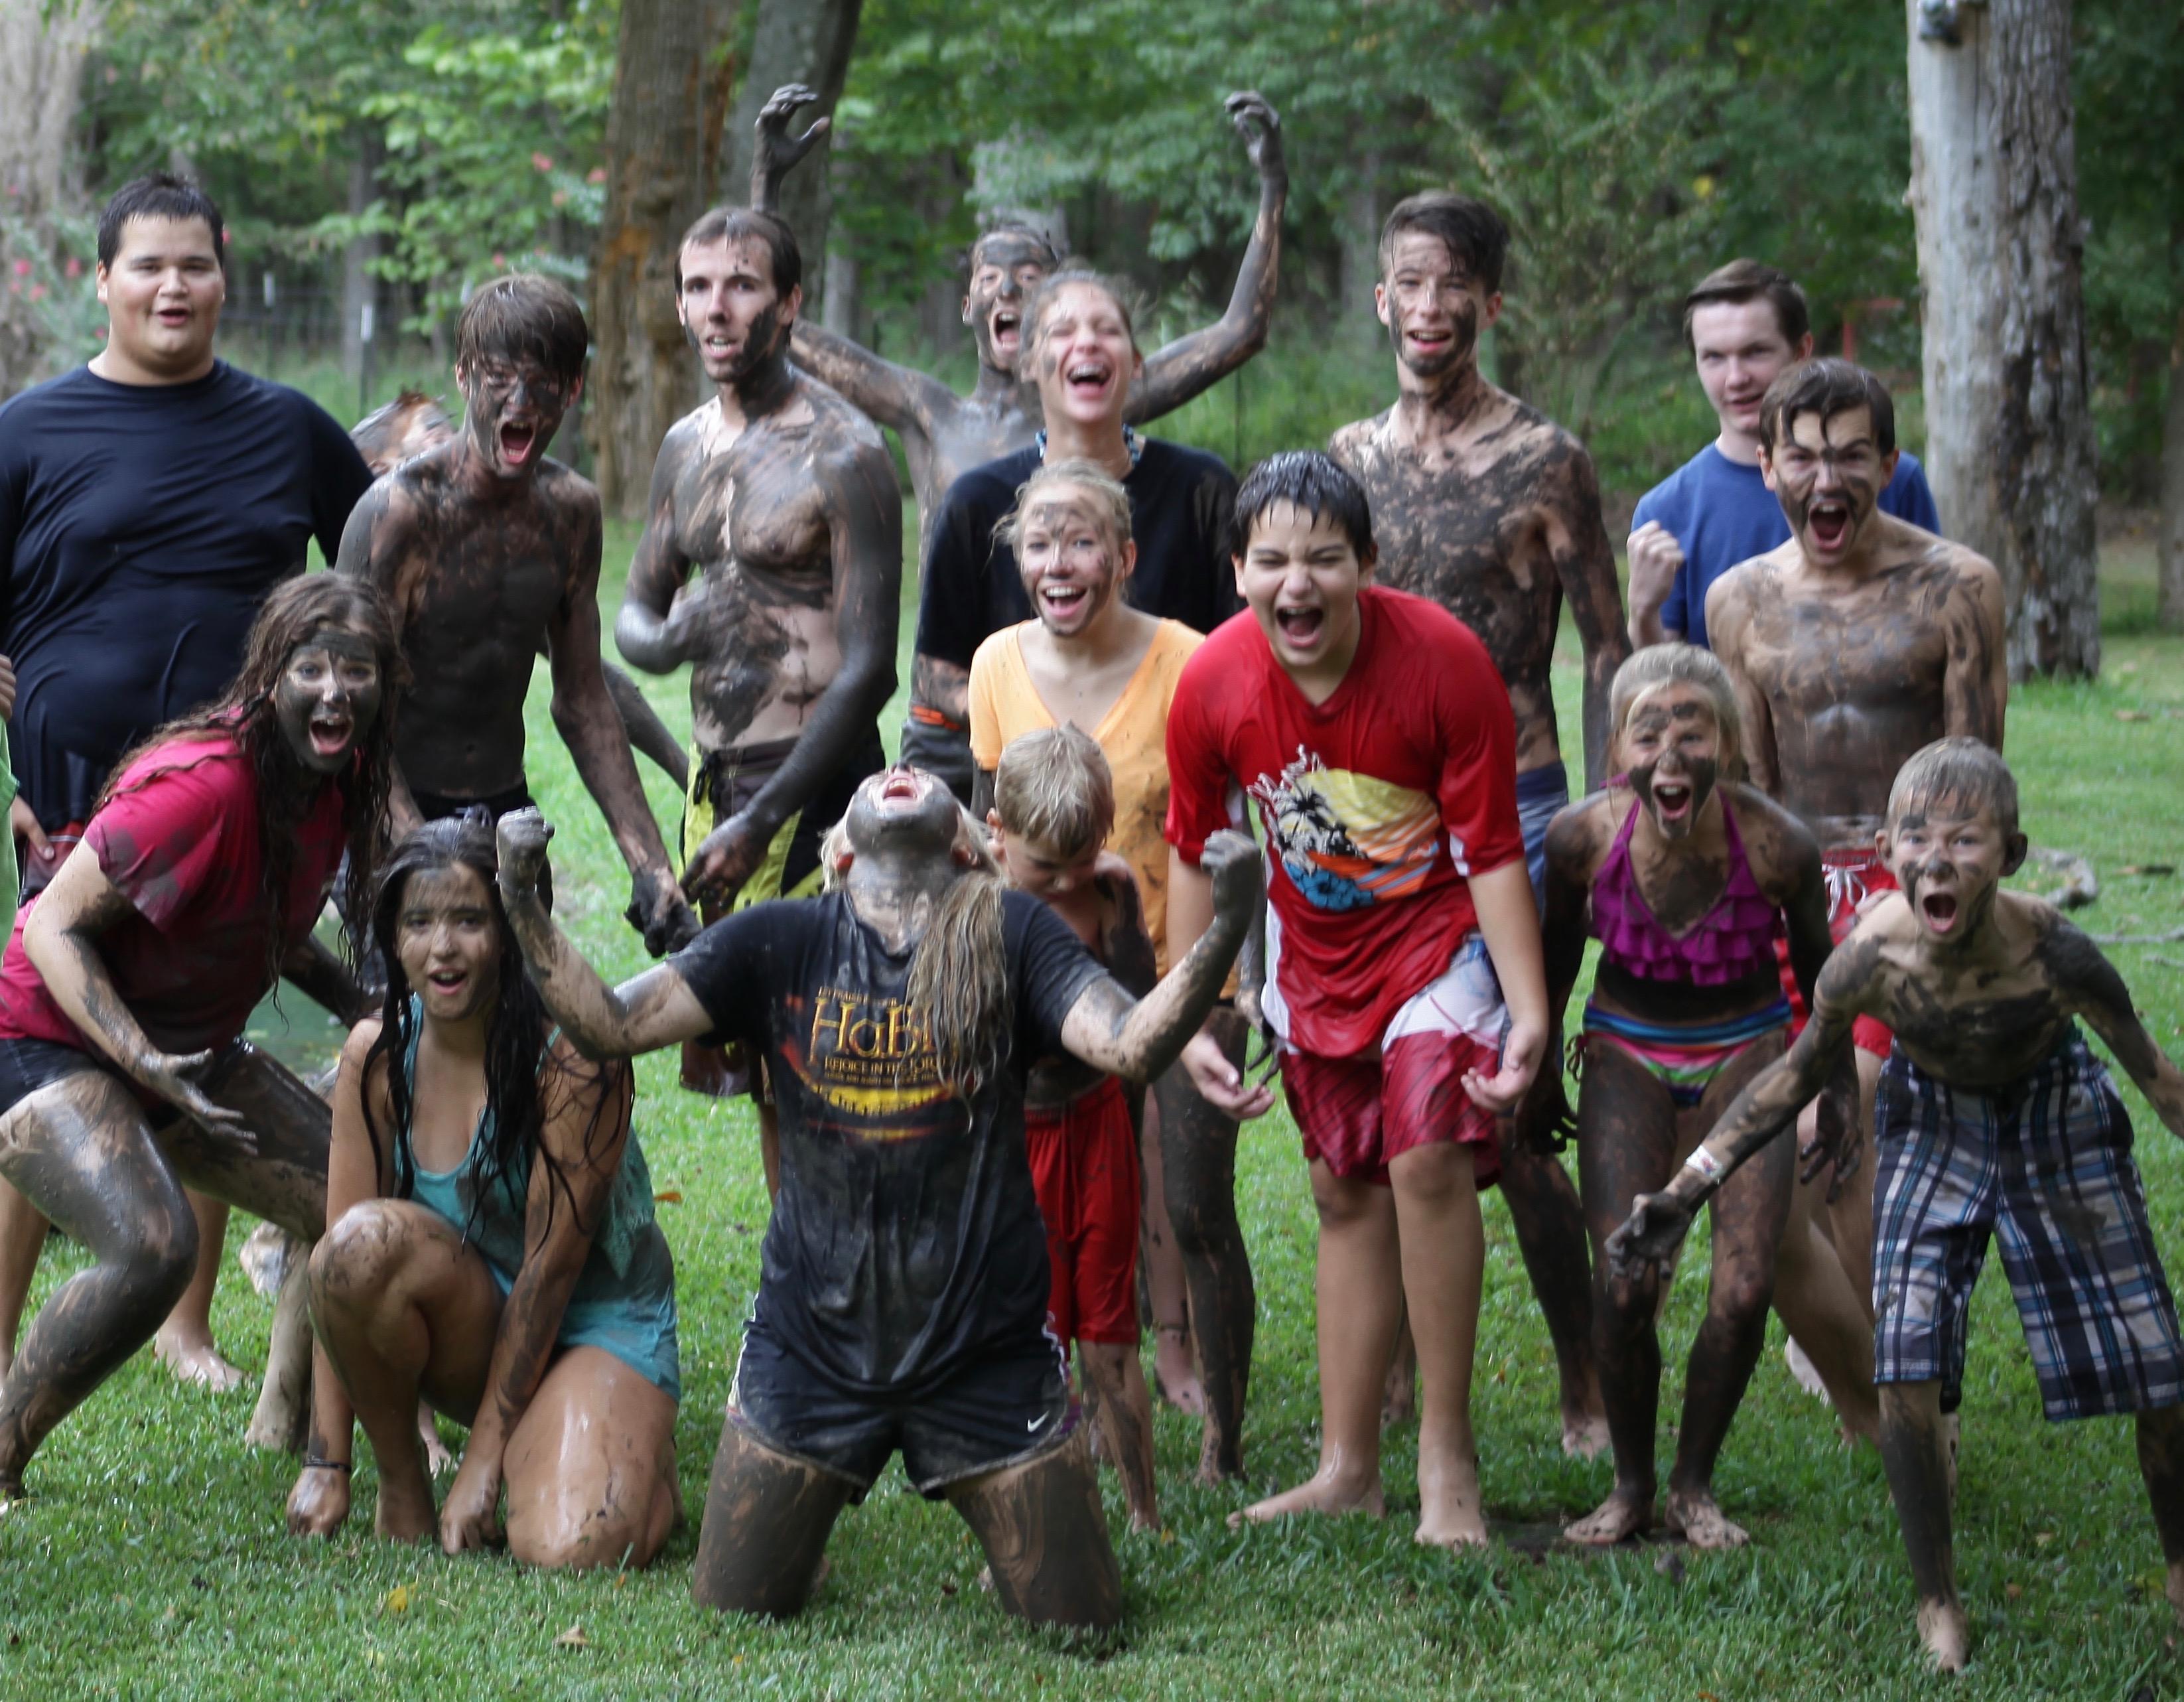 Youth Group Mud Photo